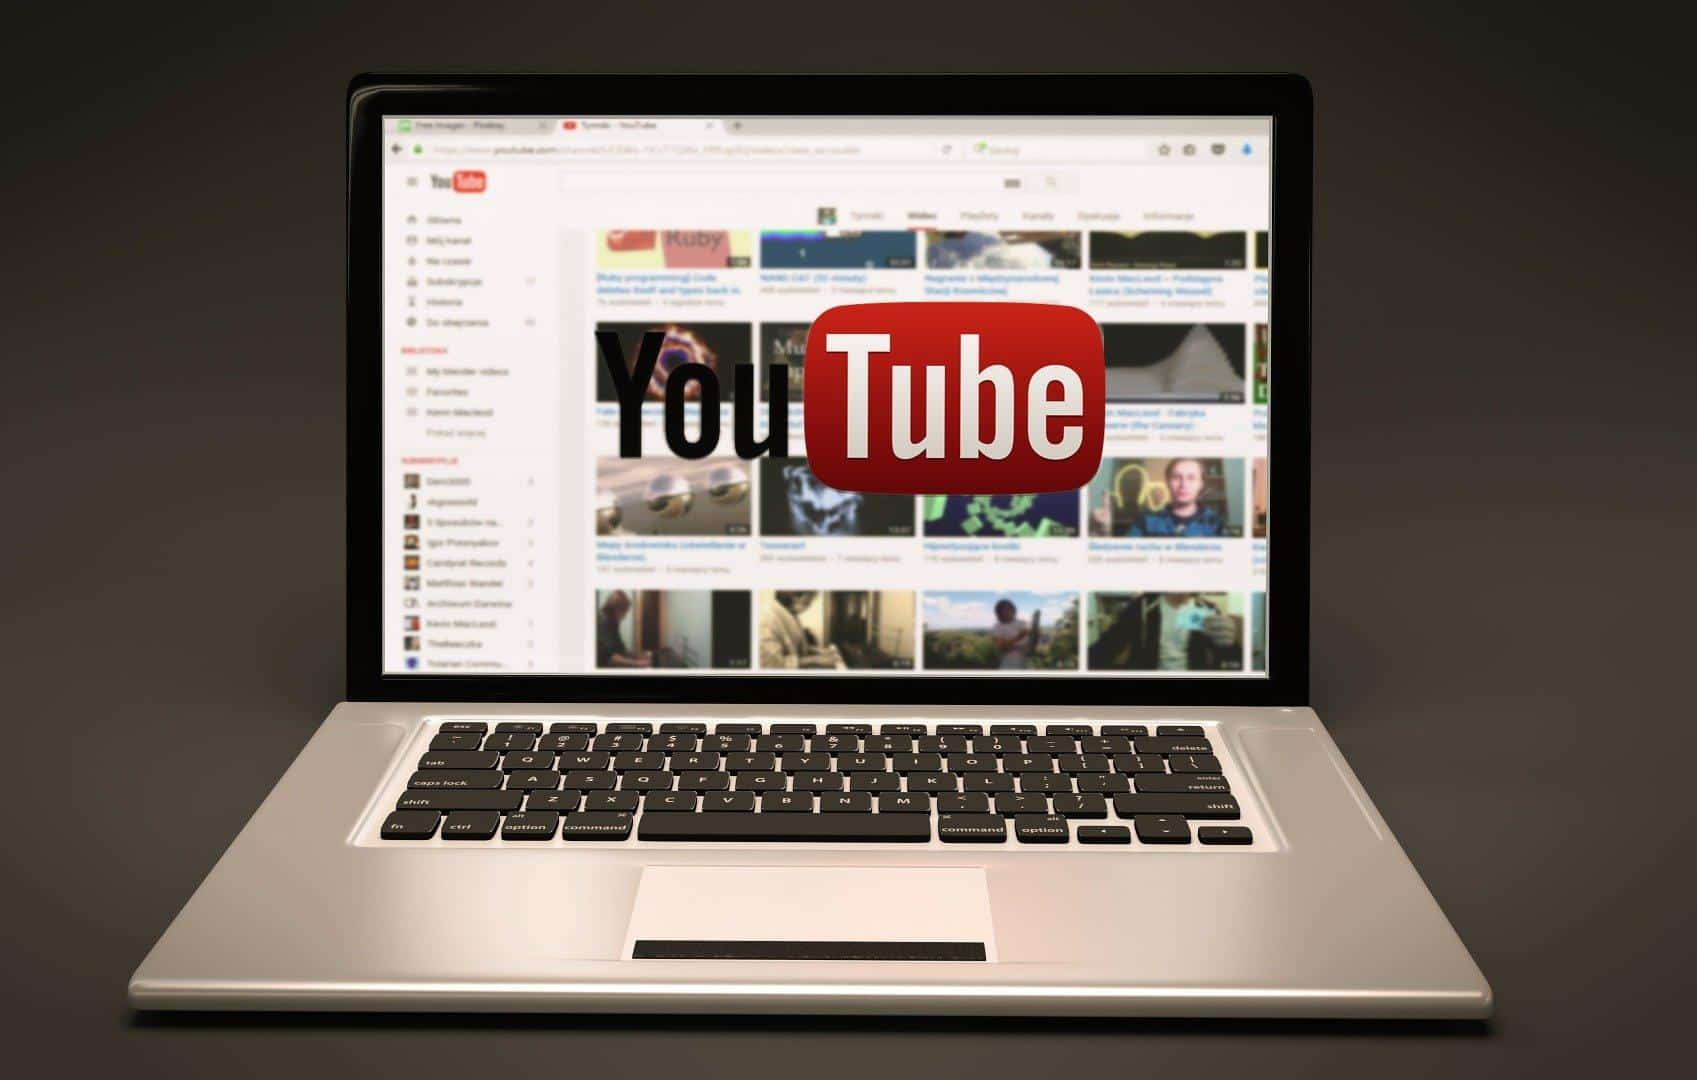 YouTube enfrenta instabilidade na noite desta quarta-feira - Olhar Digital